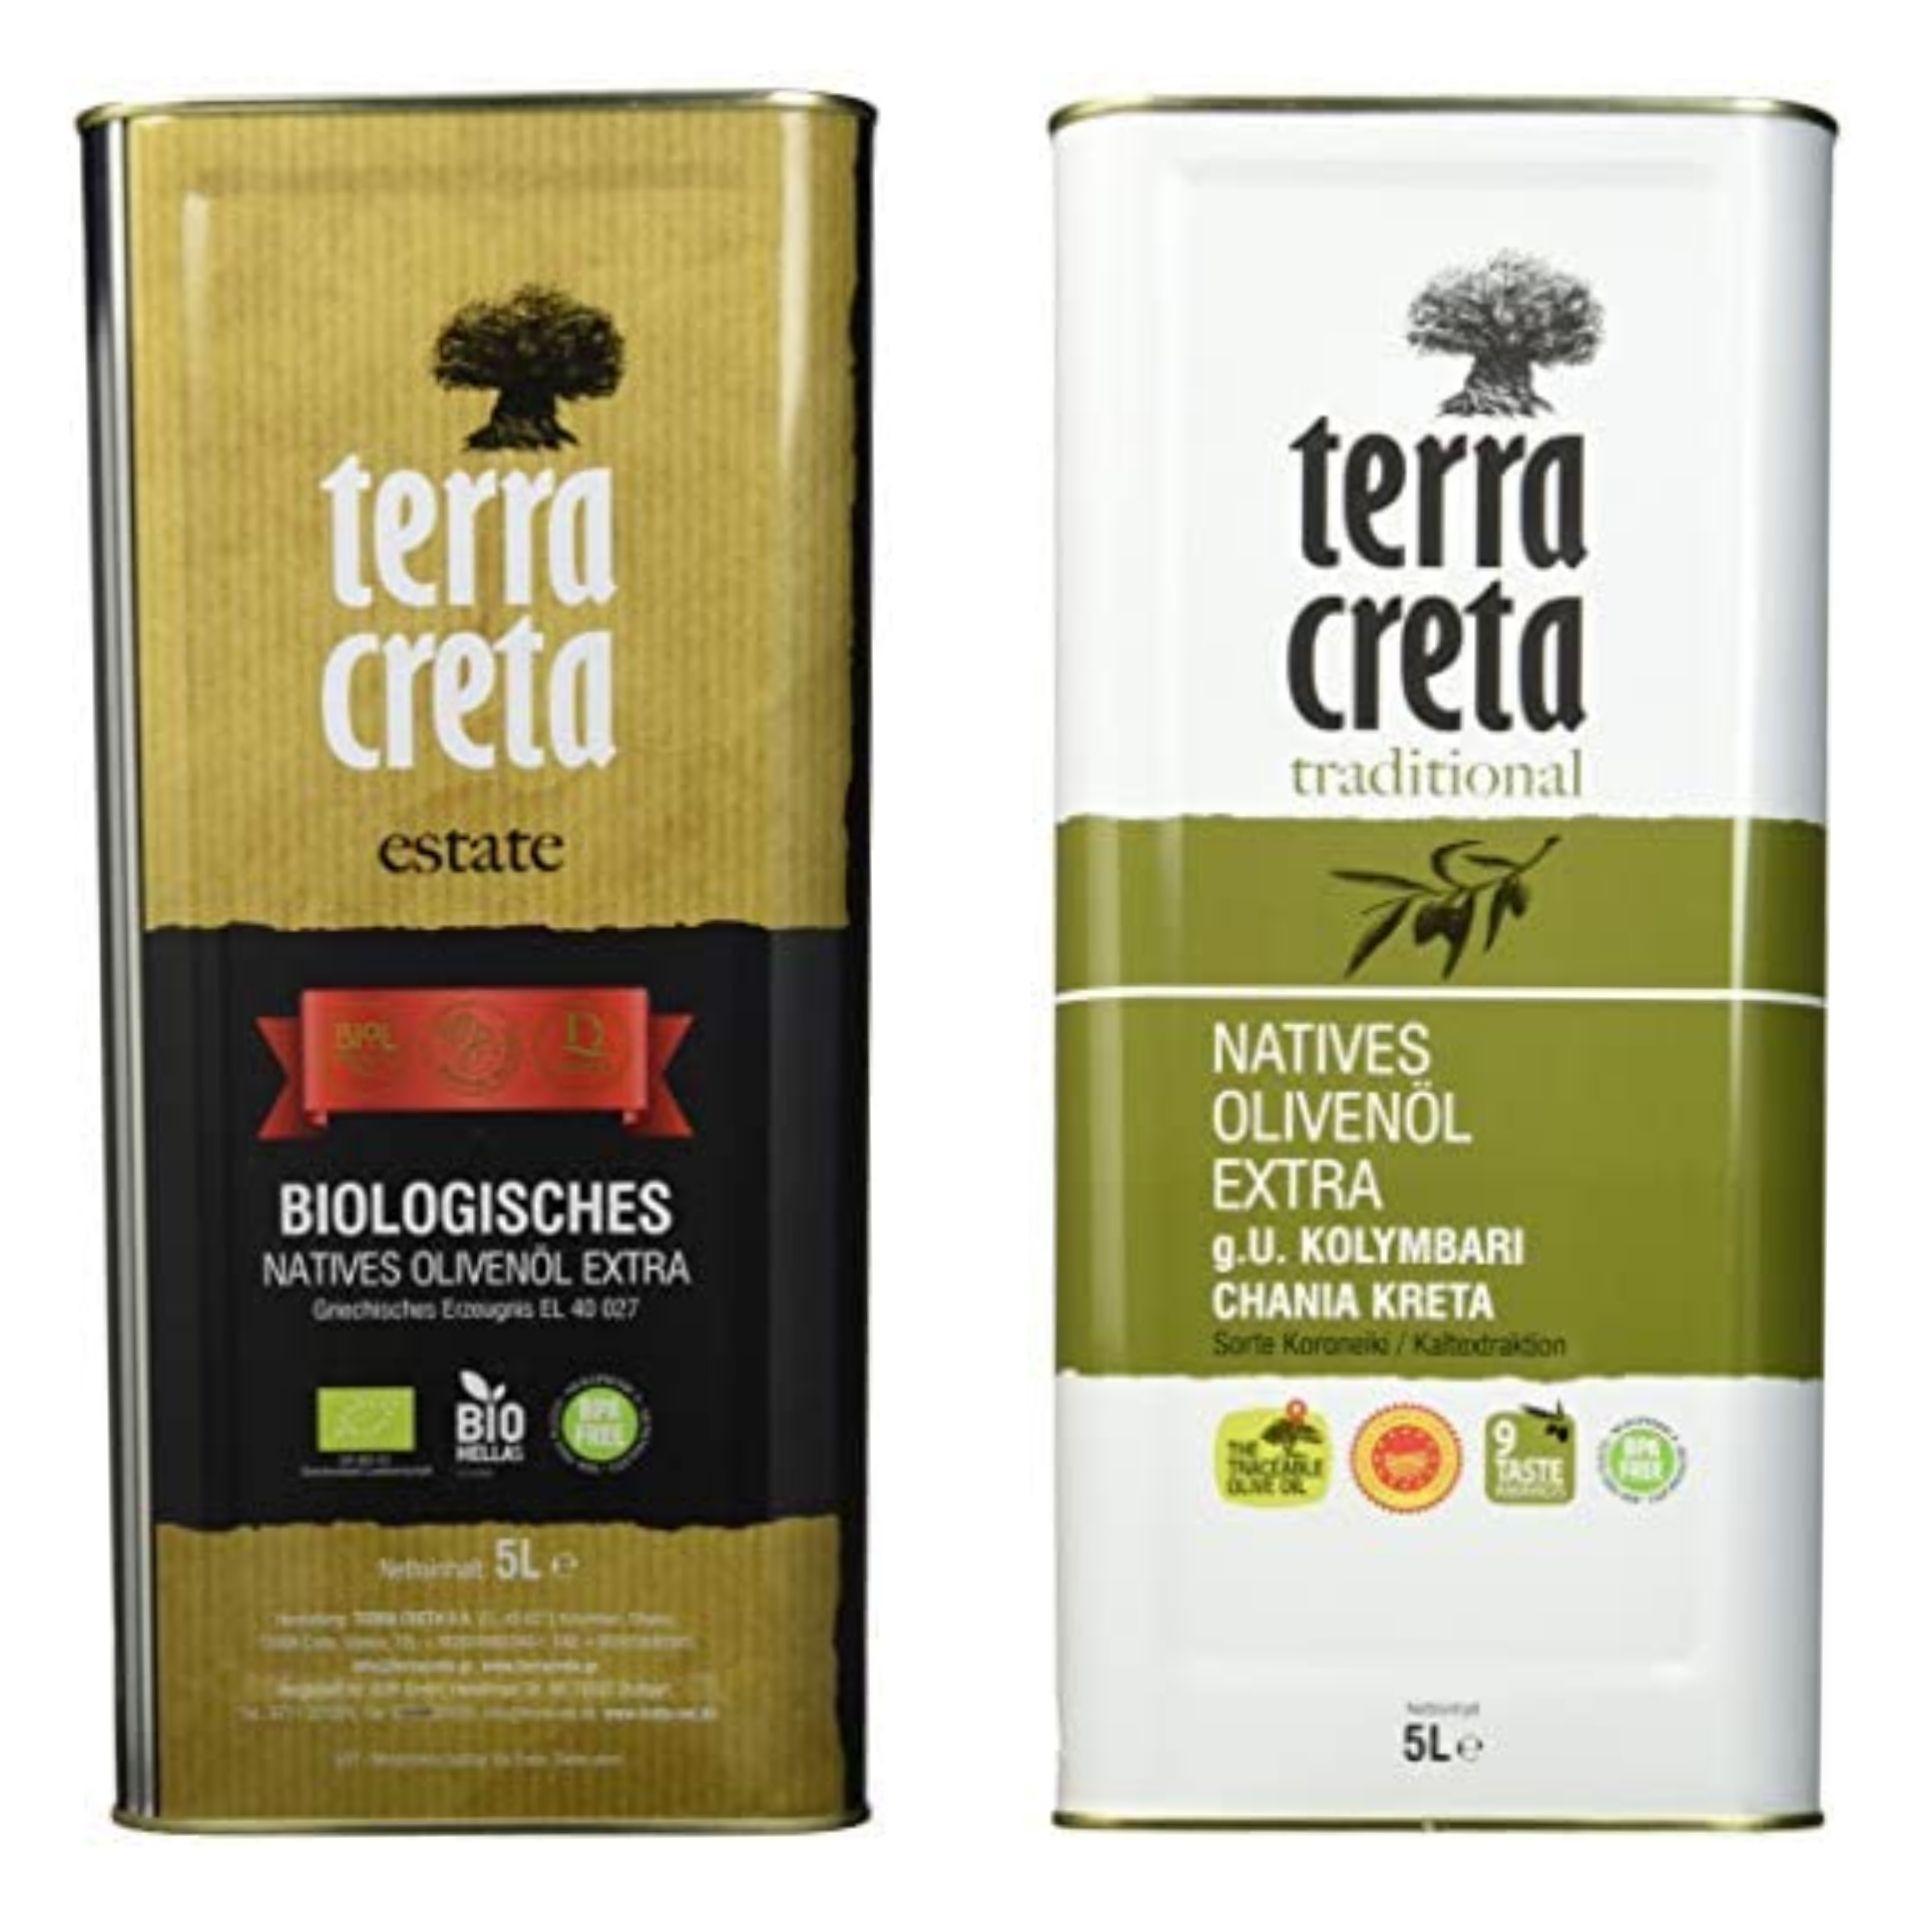 Terra Creta Extra oder Estate(Bio) Natives Olivenöl 5 l, durch 5er Sparabo für 26,94€ - Prime *Sparabo*